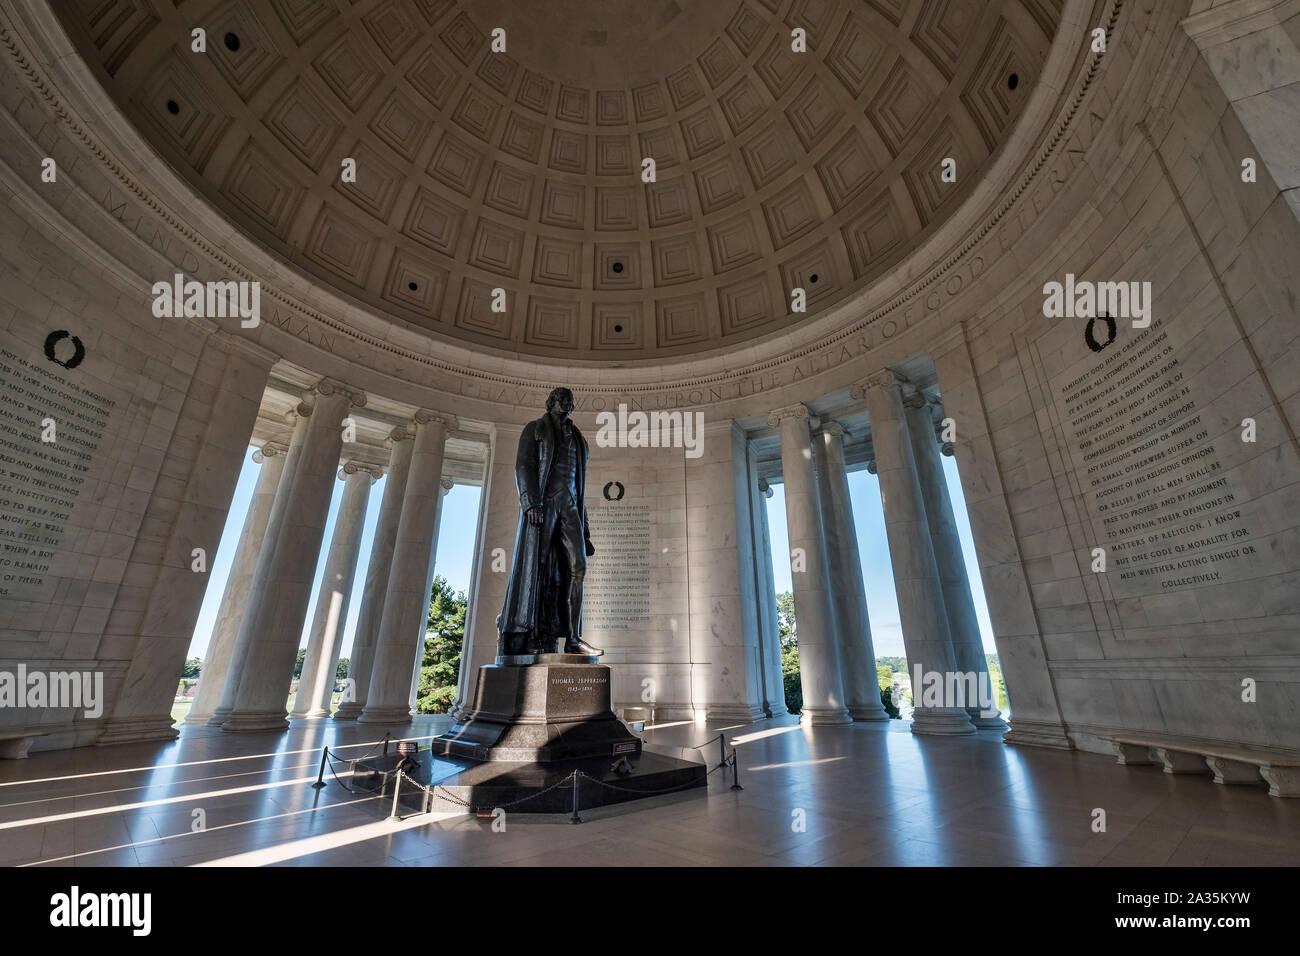 Statue of Thomas Jefferson, Inside the Jefferson Memorial, Washington DC, USA Stock Photo